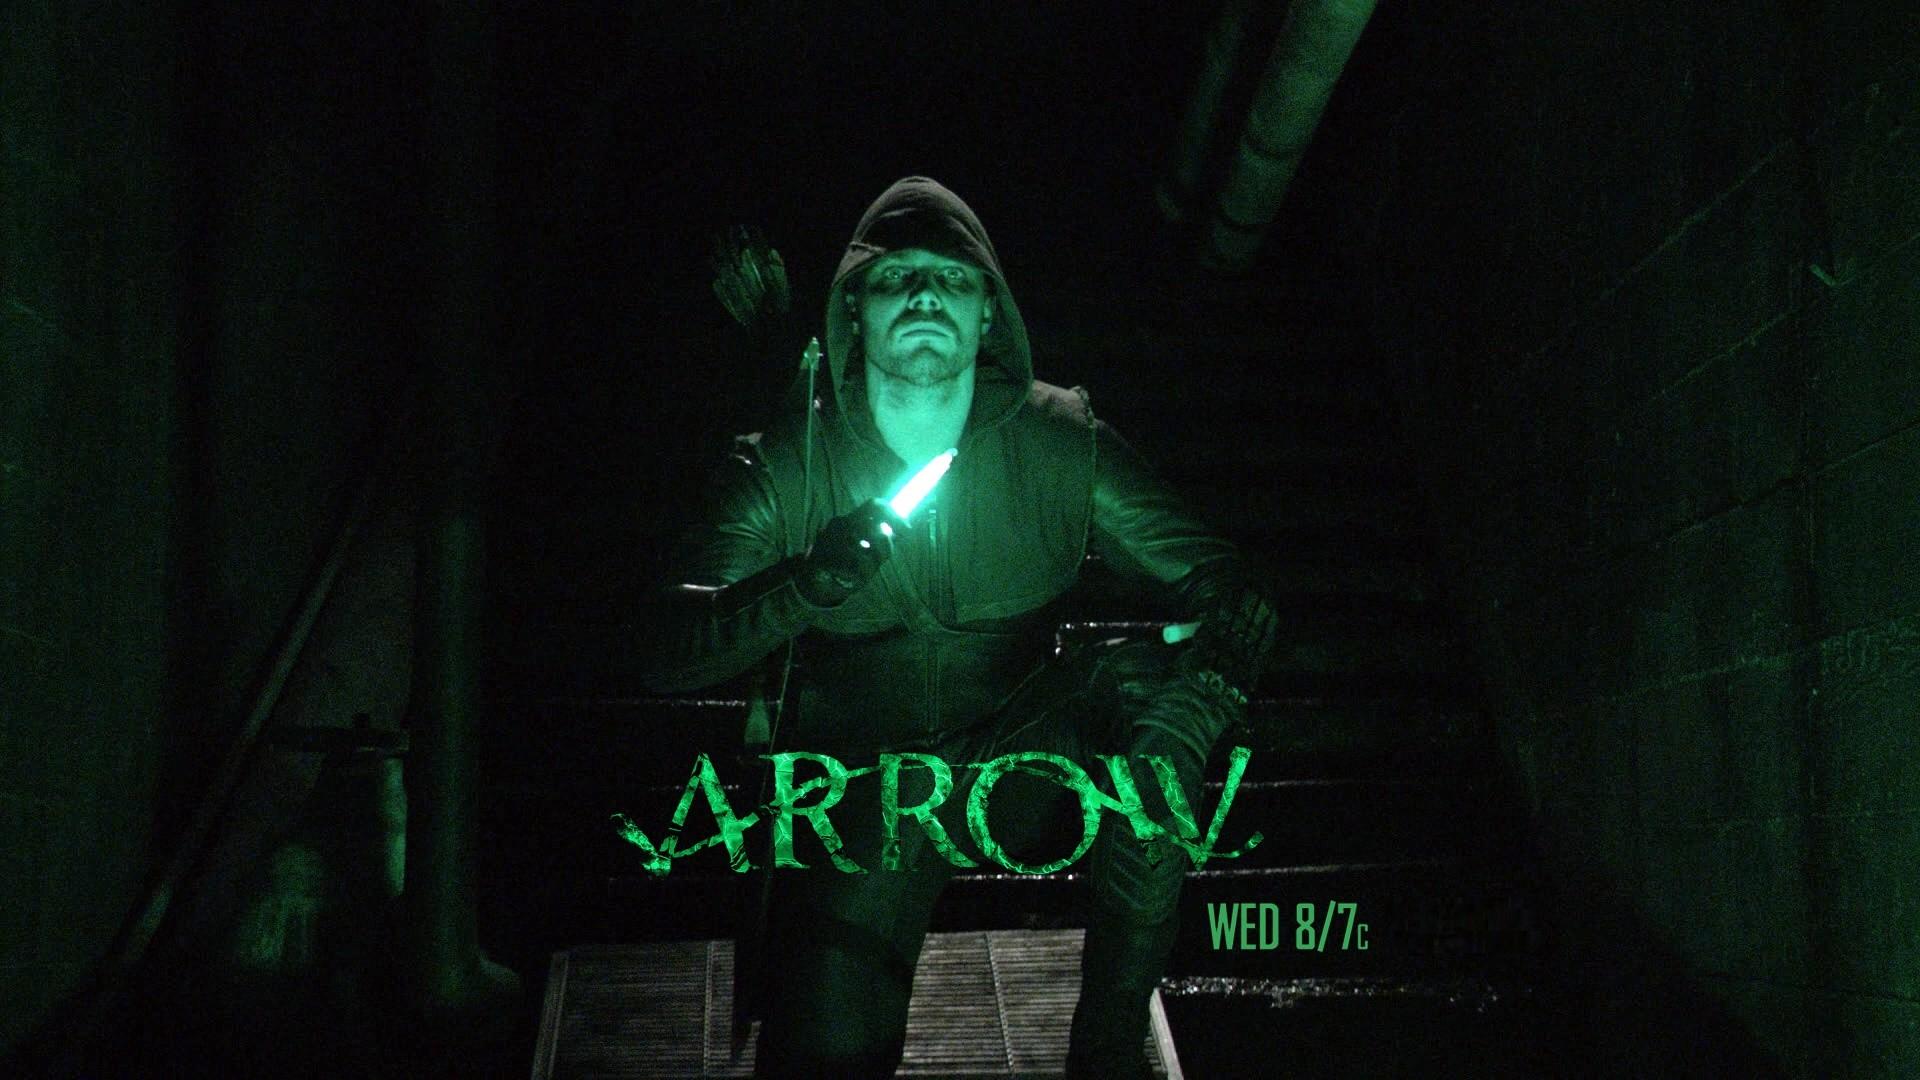 28 Arrow Season 7 Wallpapers On Wallpapersafari